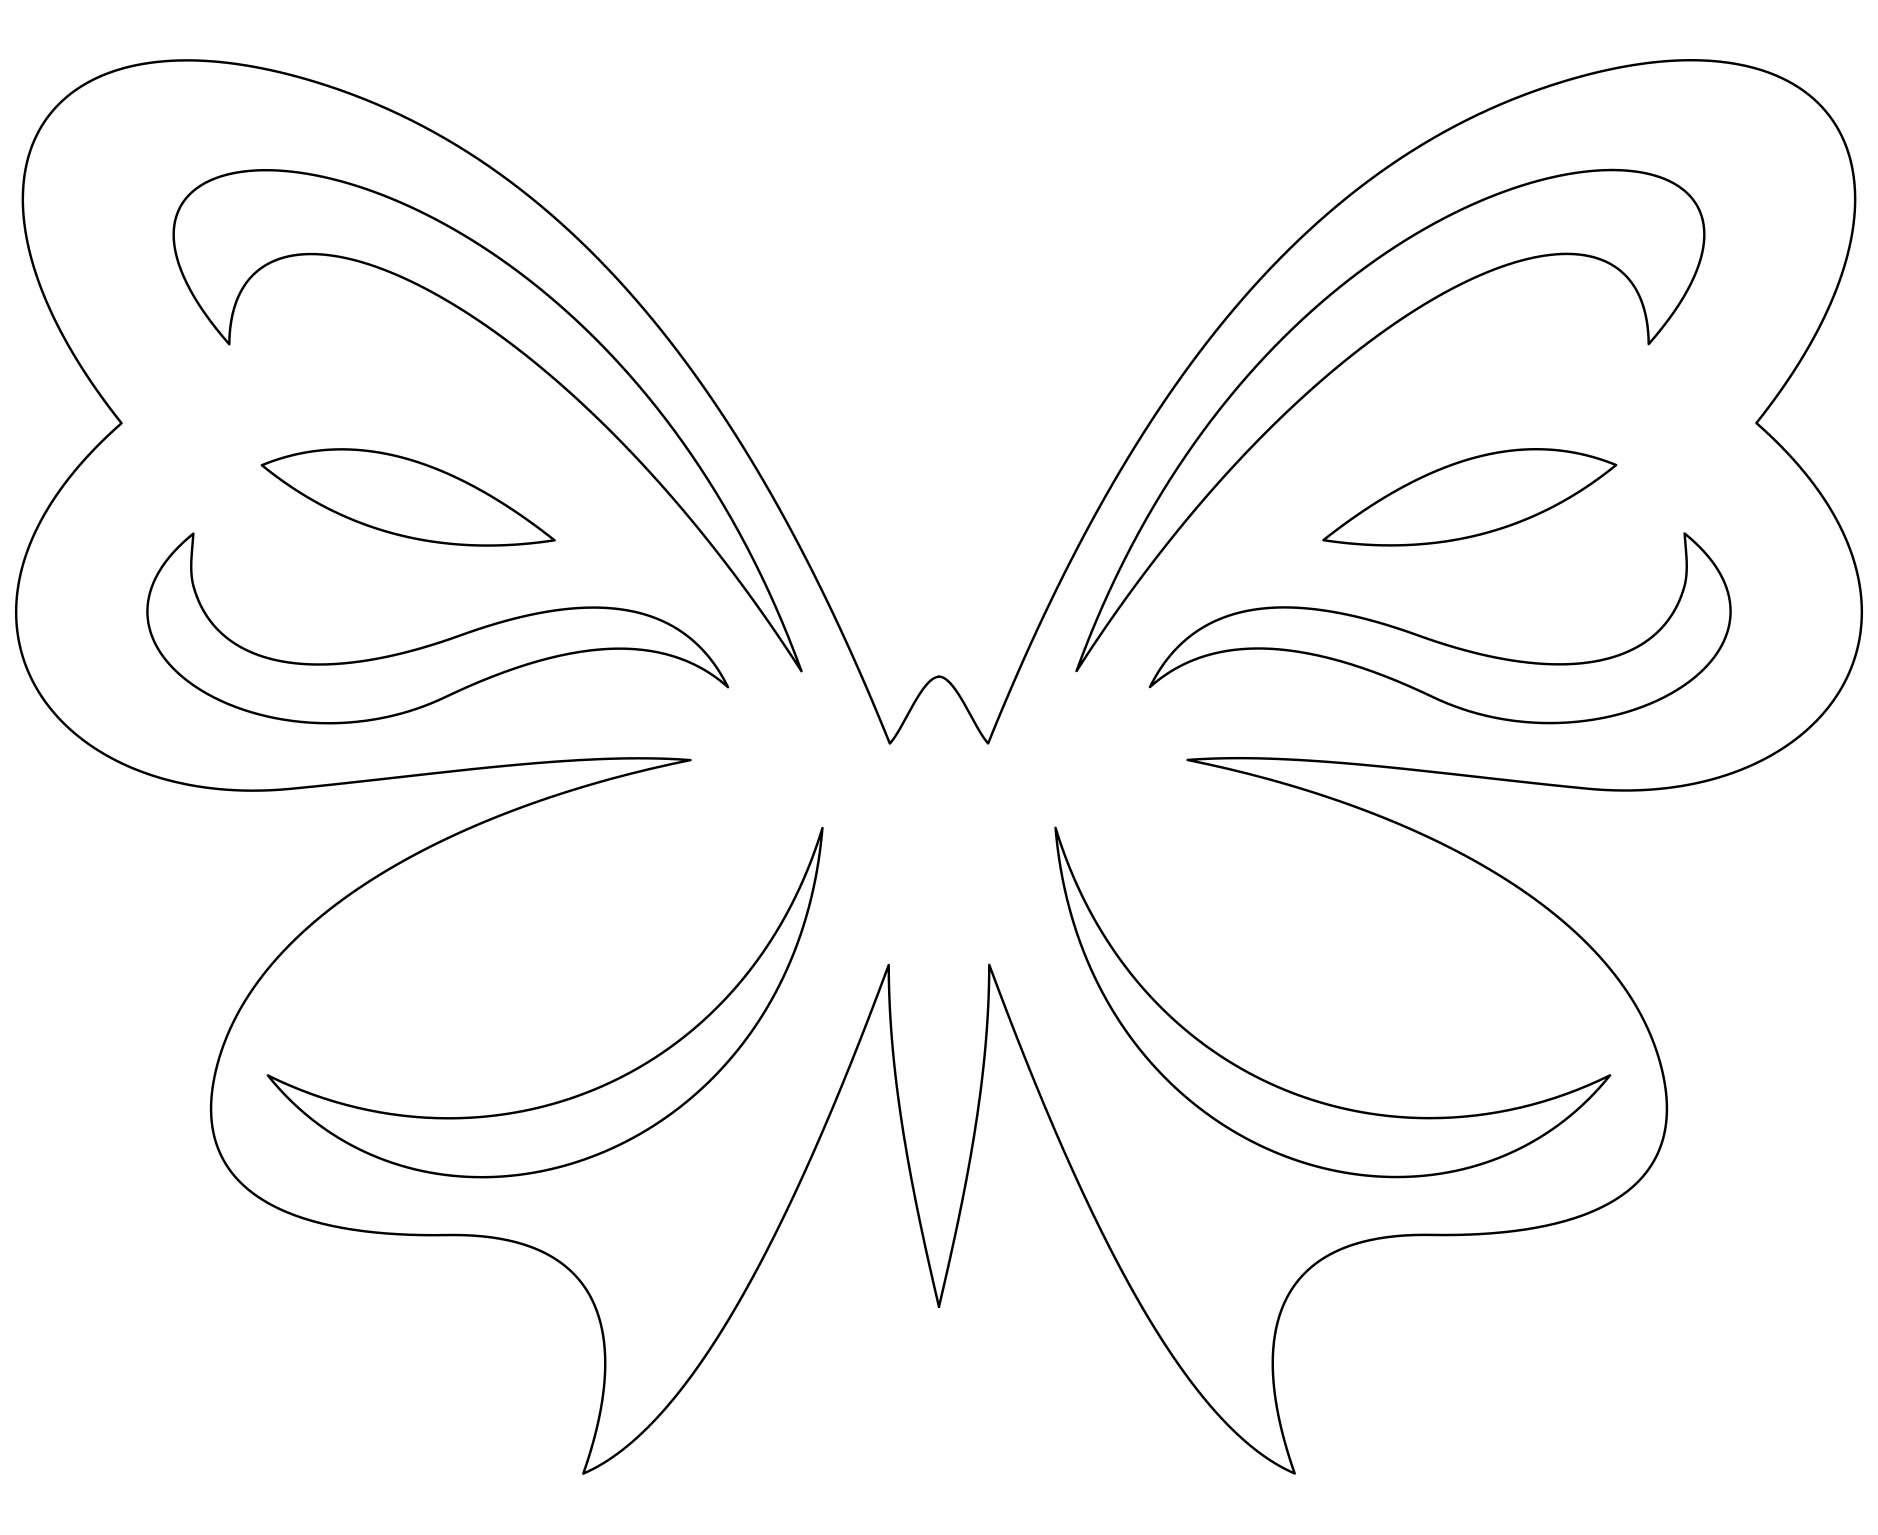 Открытка, трафареты бабочек для открыток